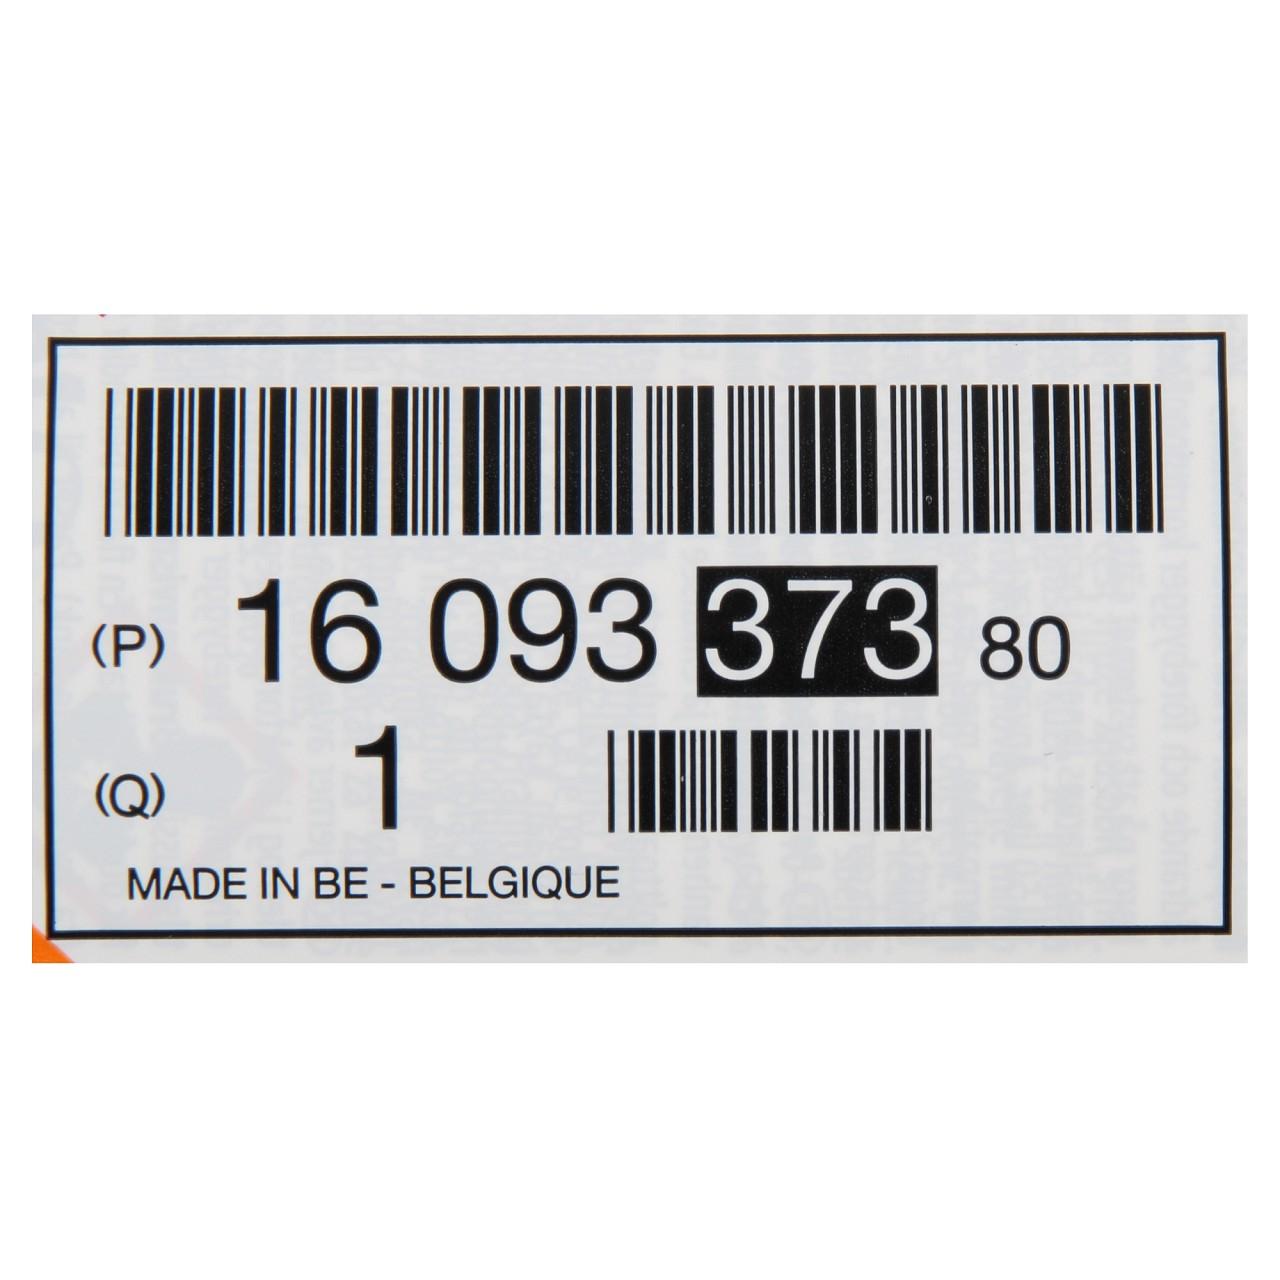 ORIGINAL PSA Kraftstoffadditiv Unik+ CLEANER & BOOSTER 300ml 1609337380